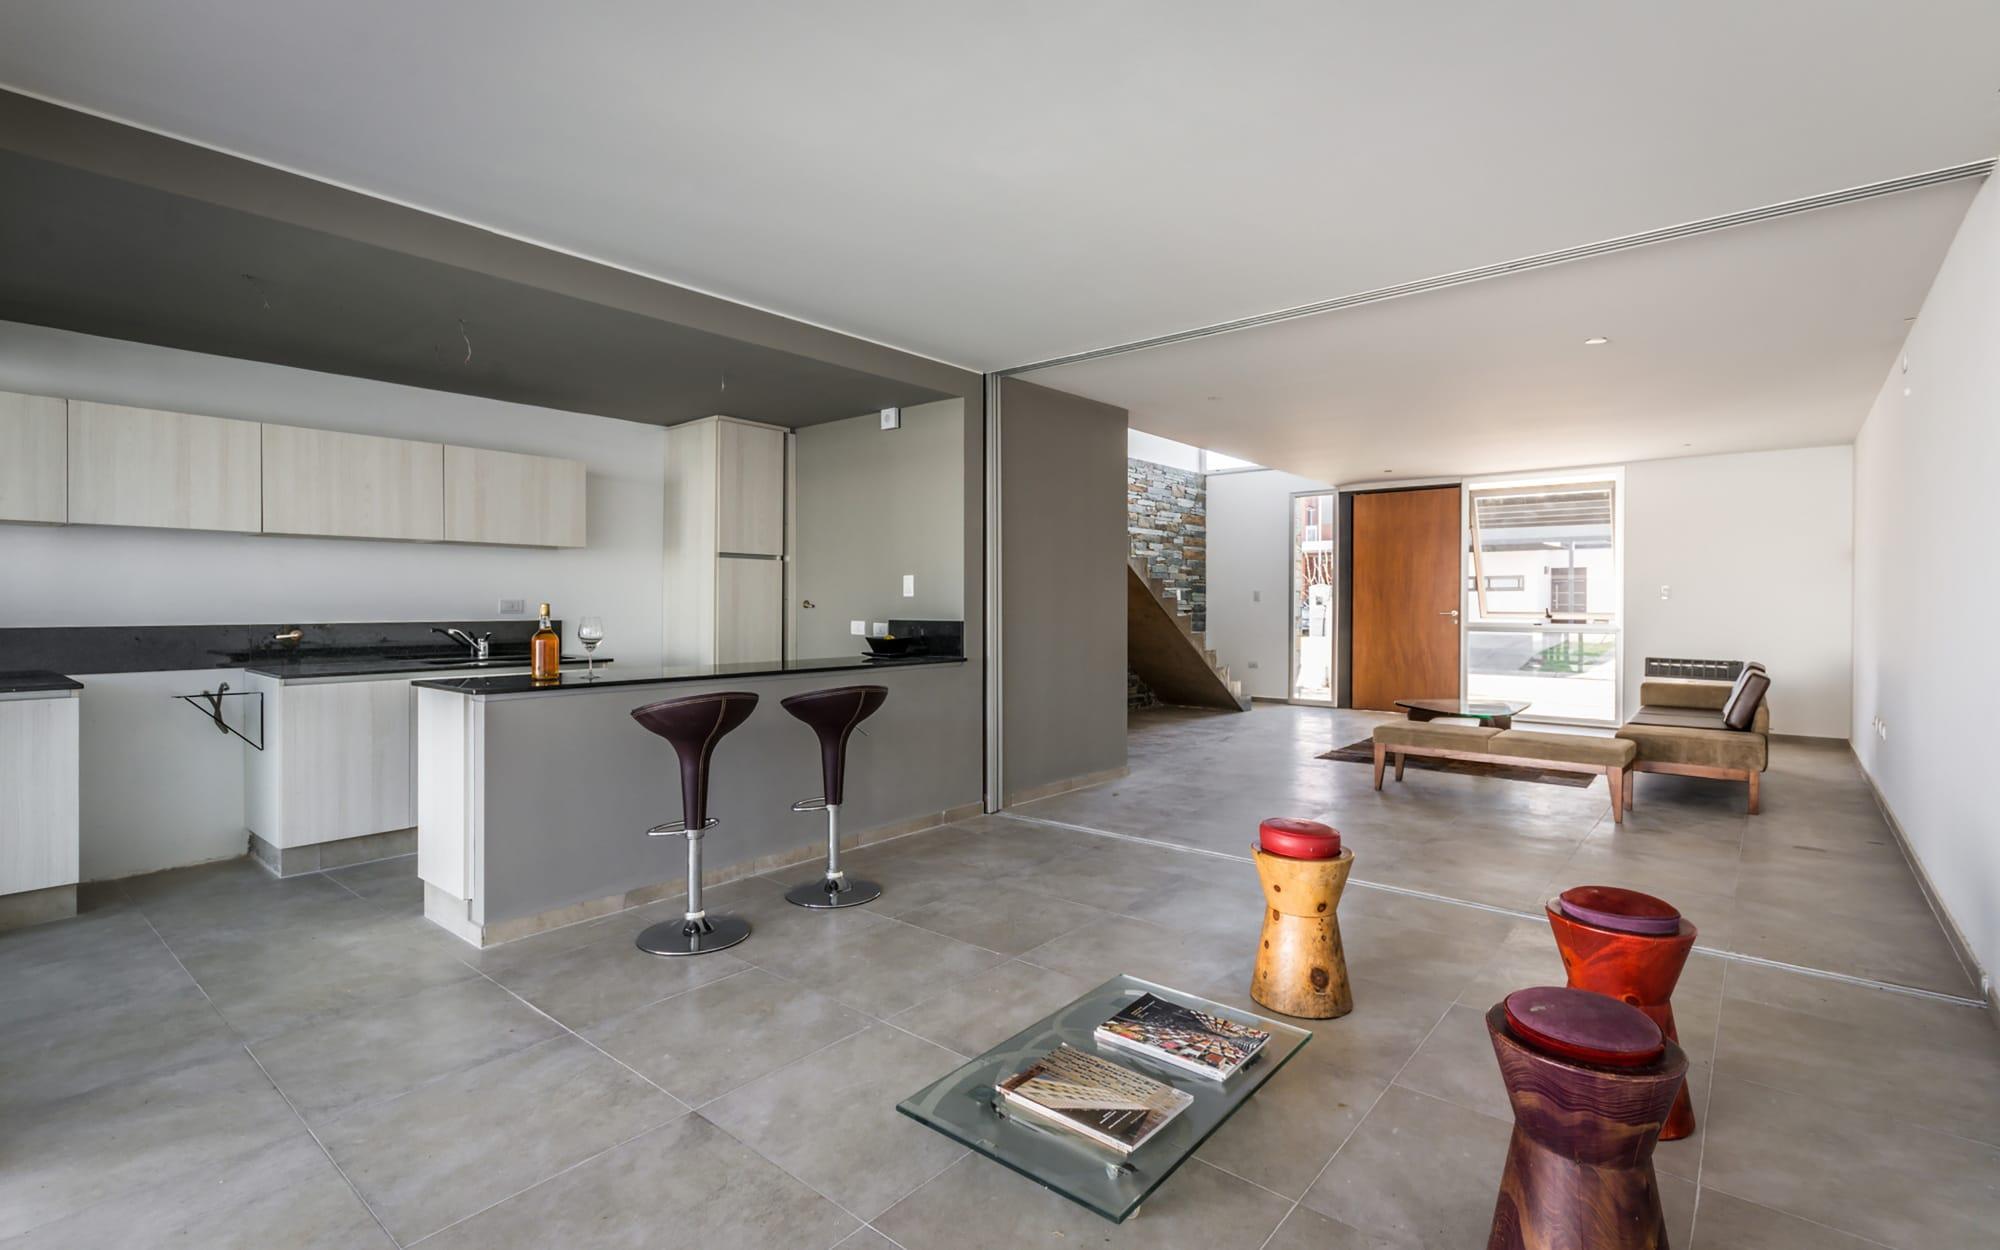 Planos de casa de dos pisos moderna construye hogar for Planos de cocinas pequenas y sencillas